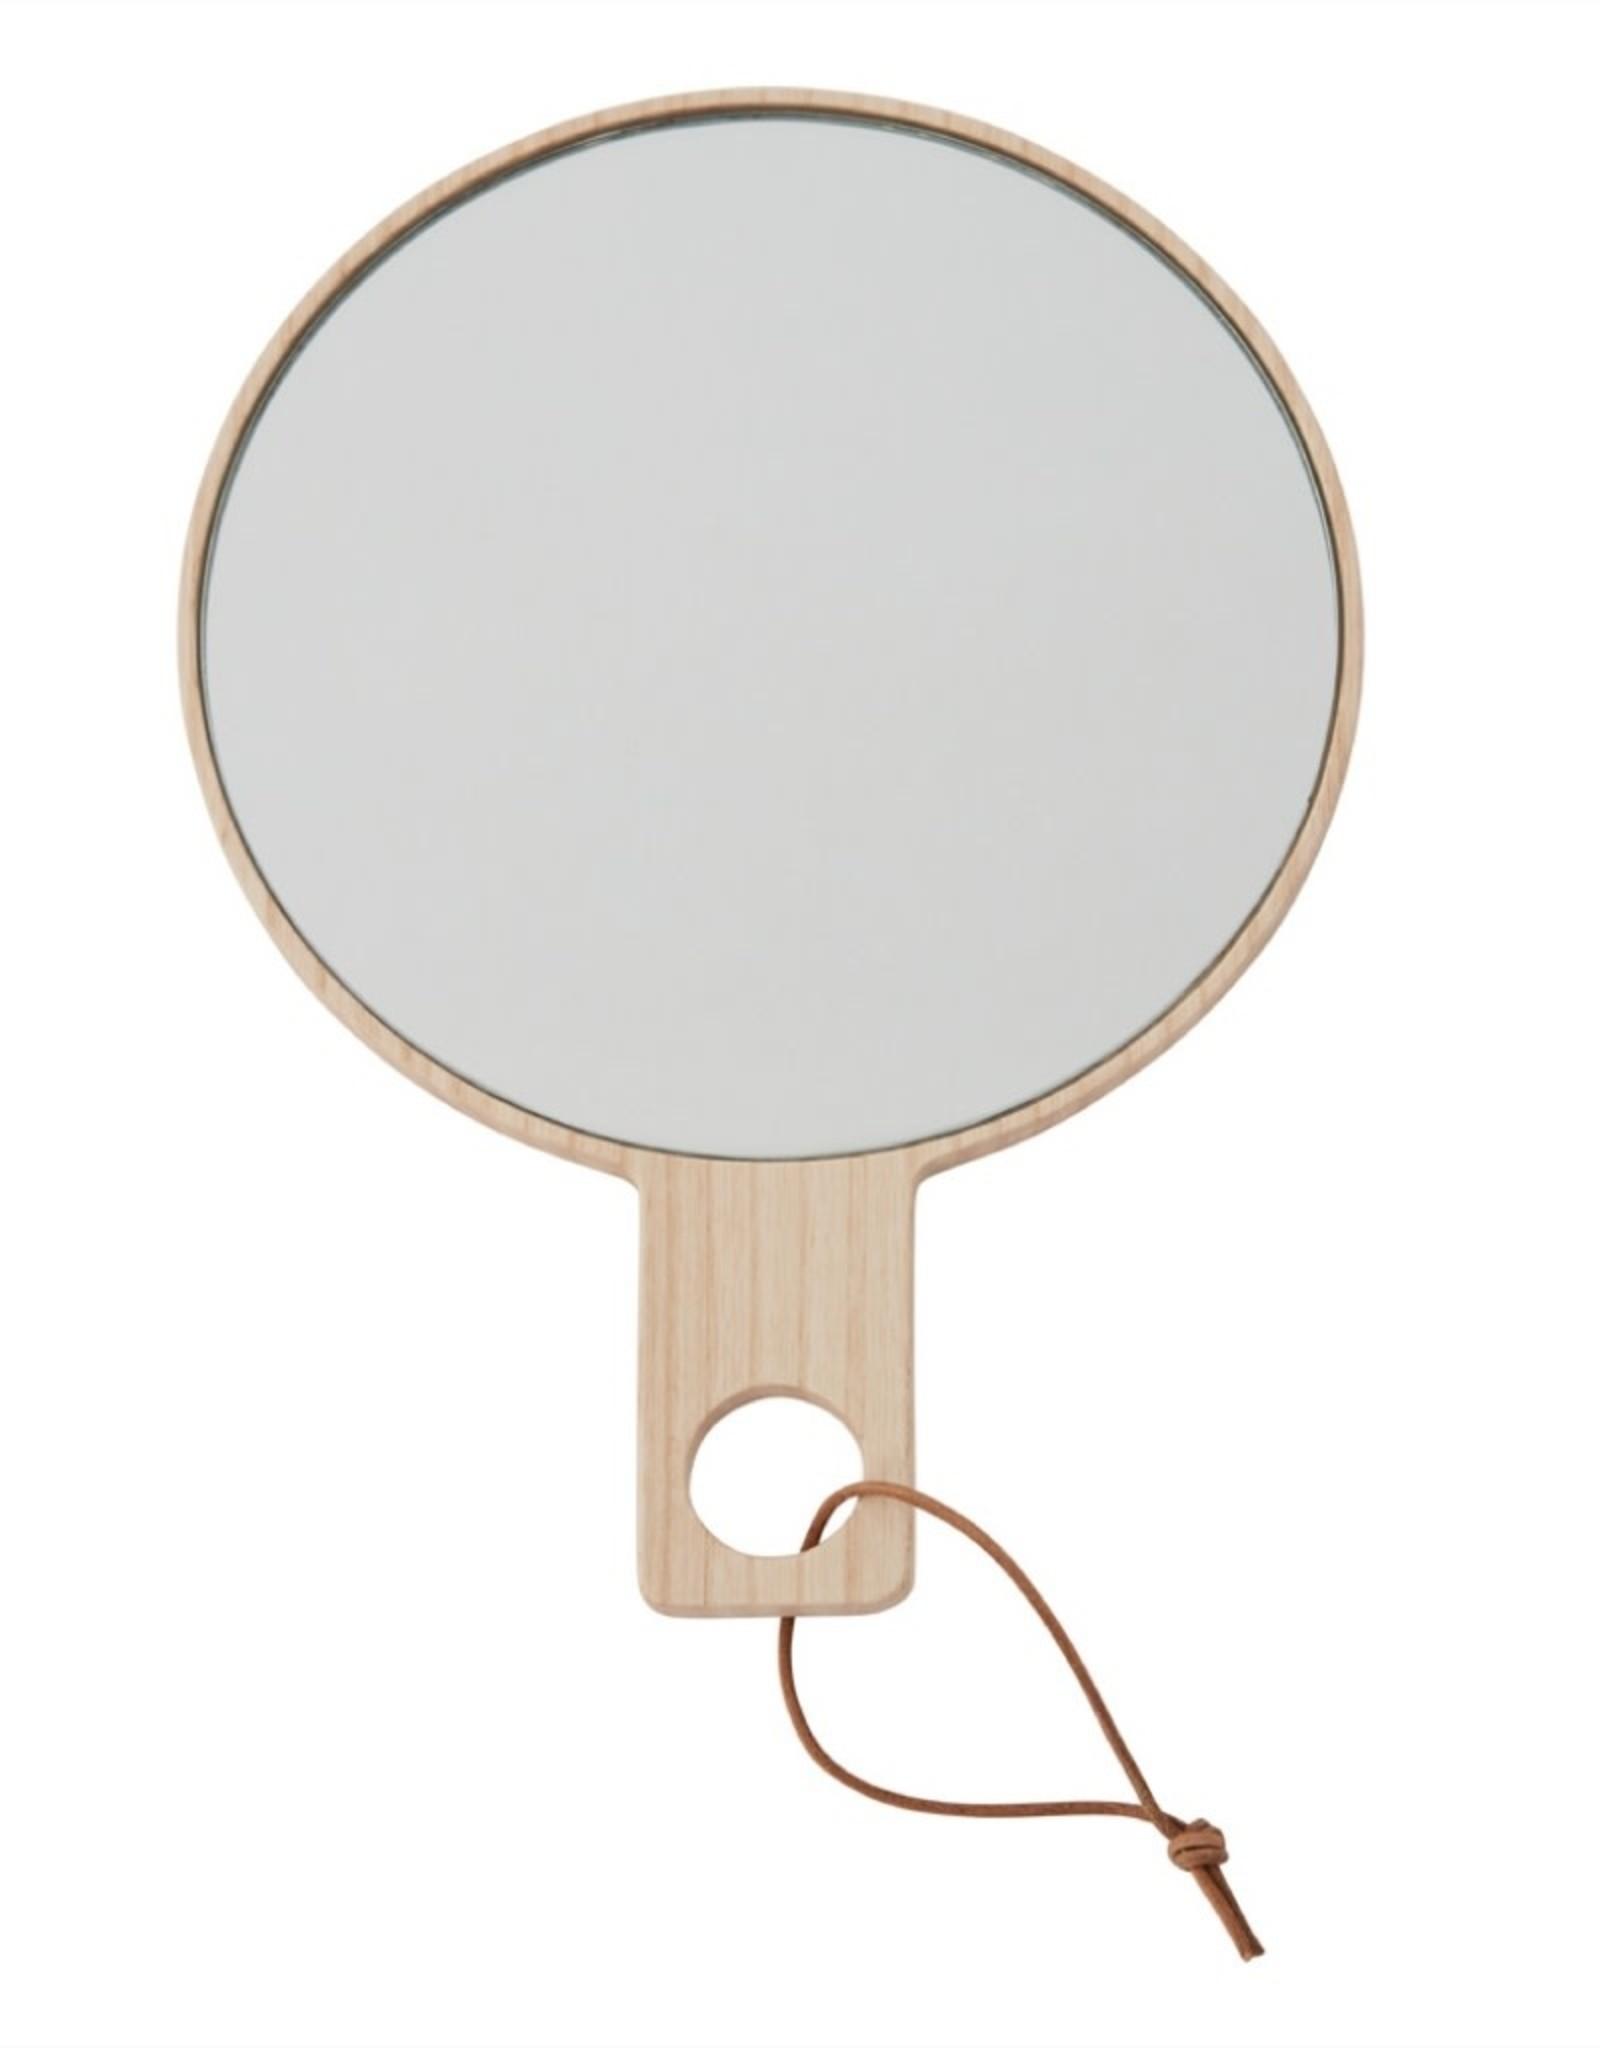 OYOY Ping Pong Handmirror - Natural